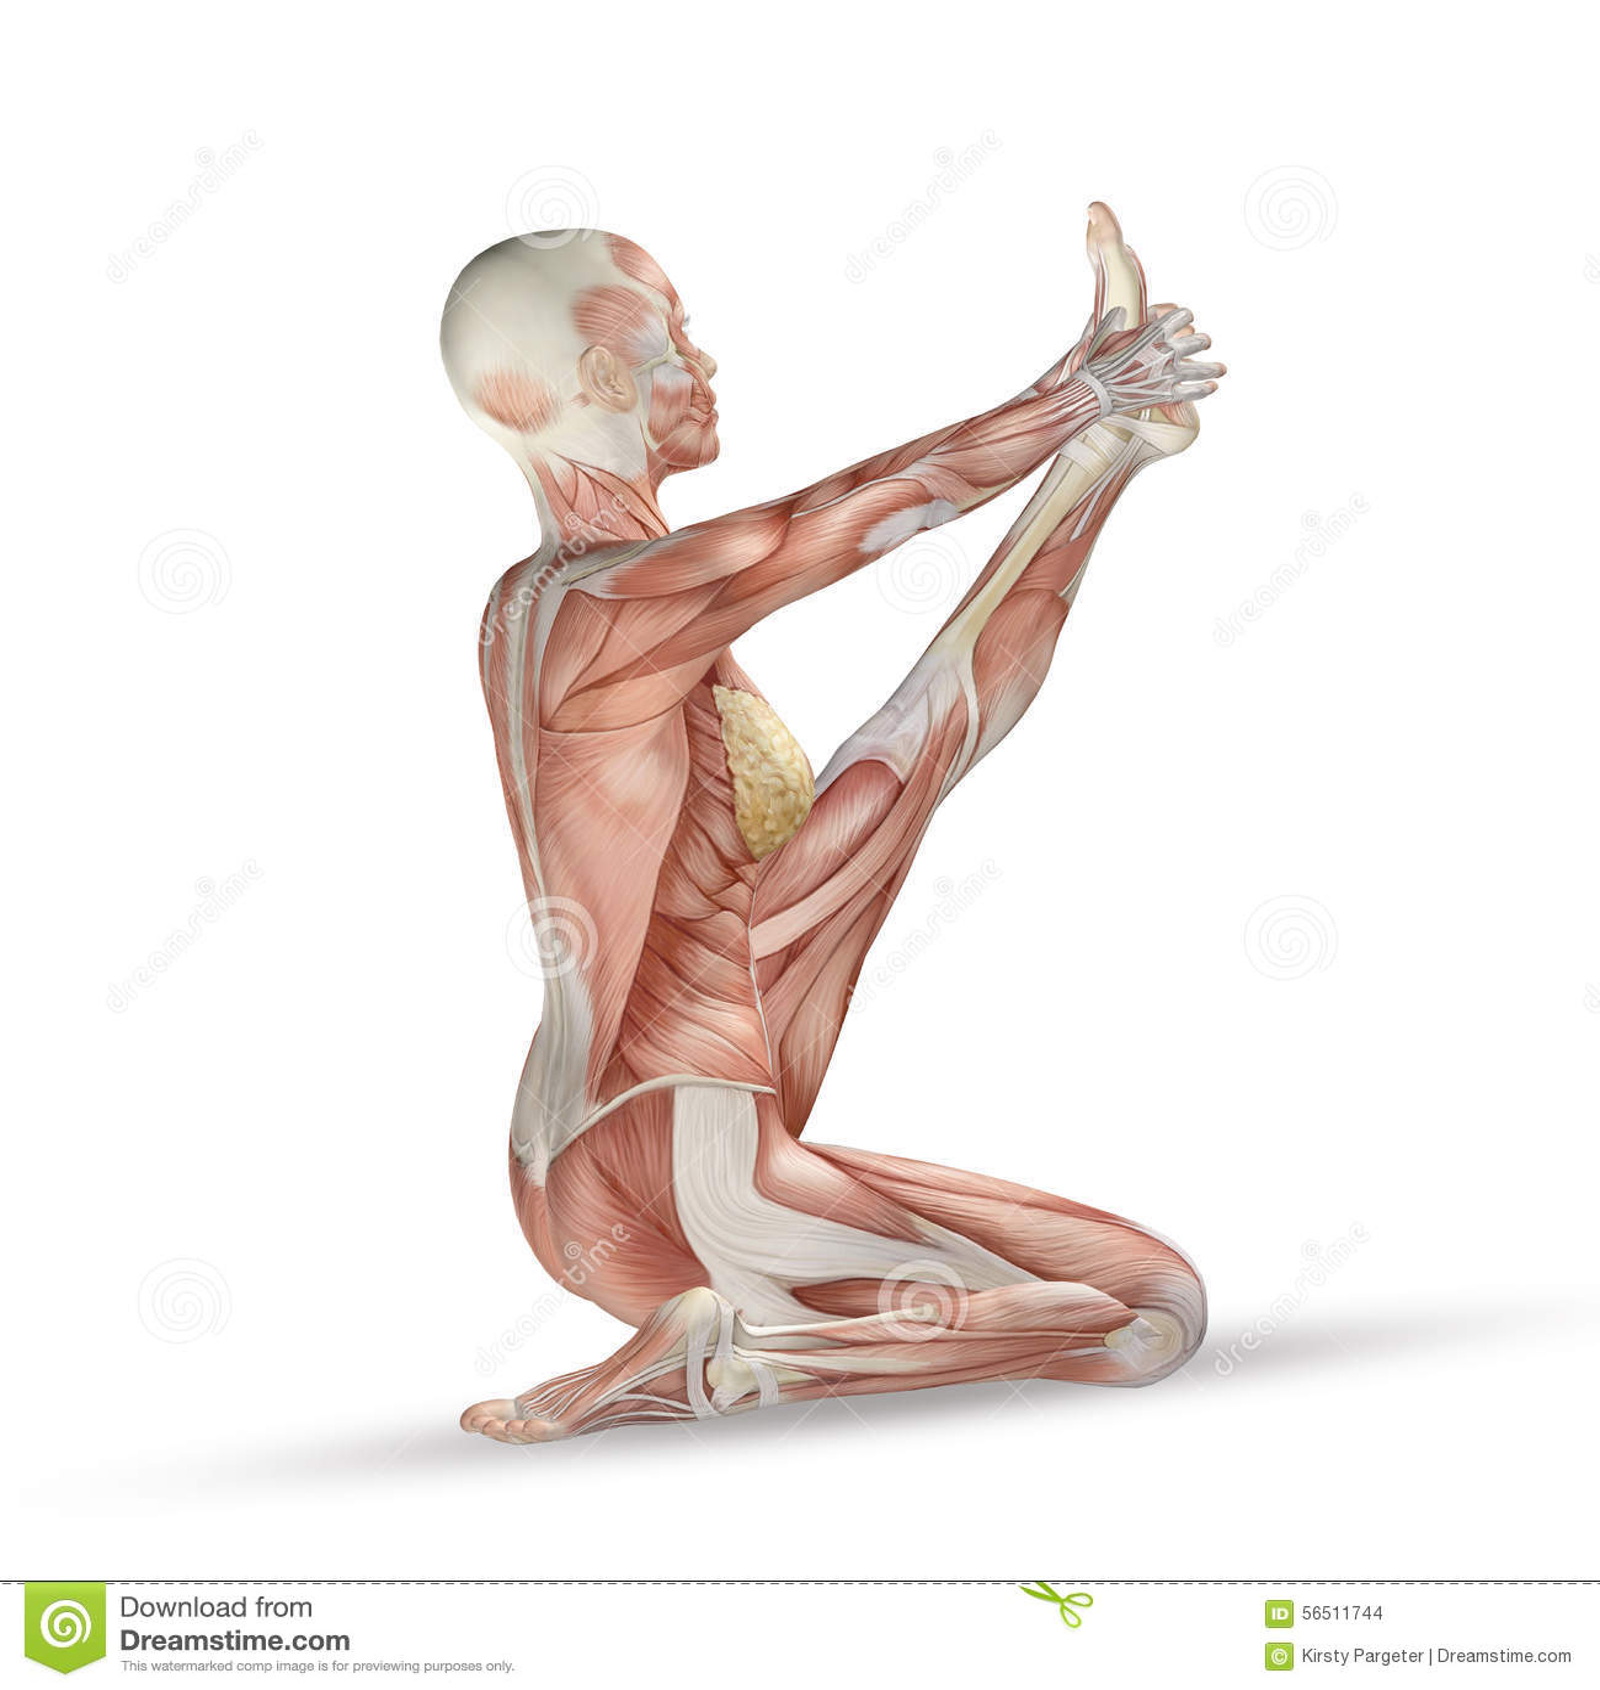 3D Medical Figure With Muscle Map In Yoga Position Stock ... on yoga energy, yoga international, yoga back, yoga stretches, yoga adrenal glands, yoga leg workout, yoga history, yoga skin, yoga peace, yoga anatomy, yoga strength, yoga mind, yoga bones,